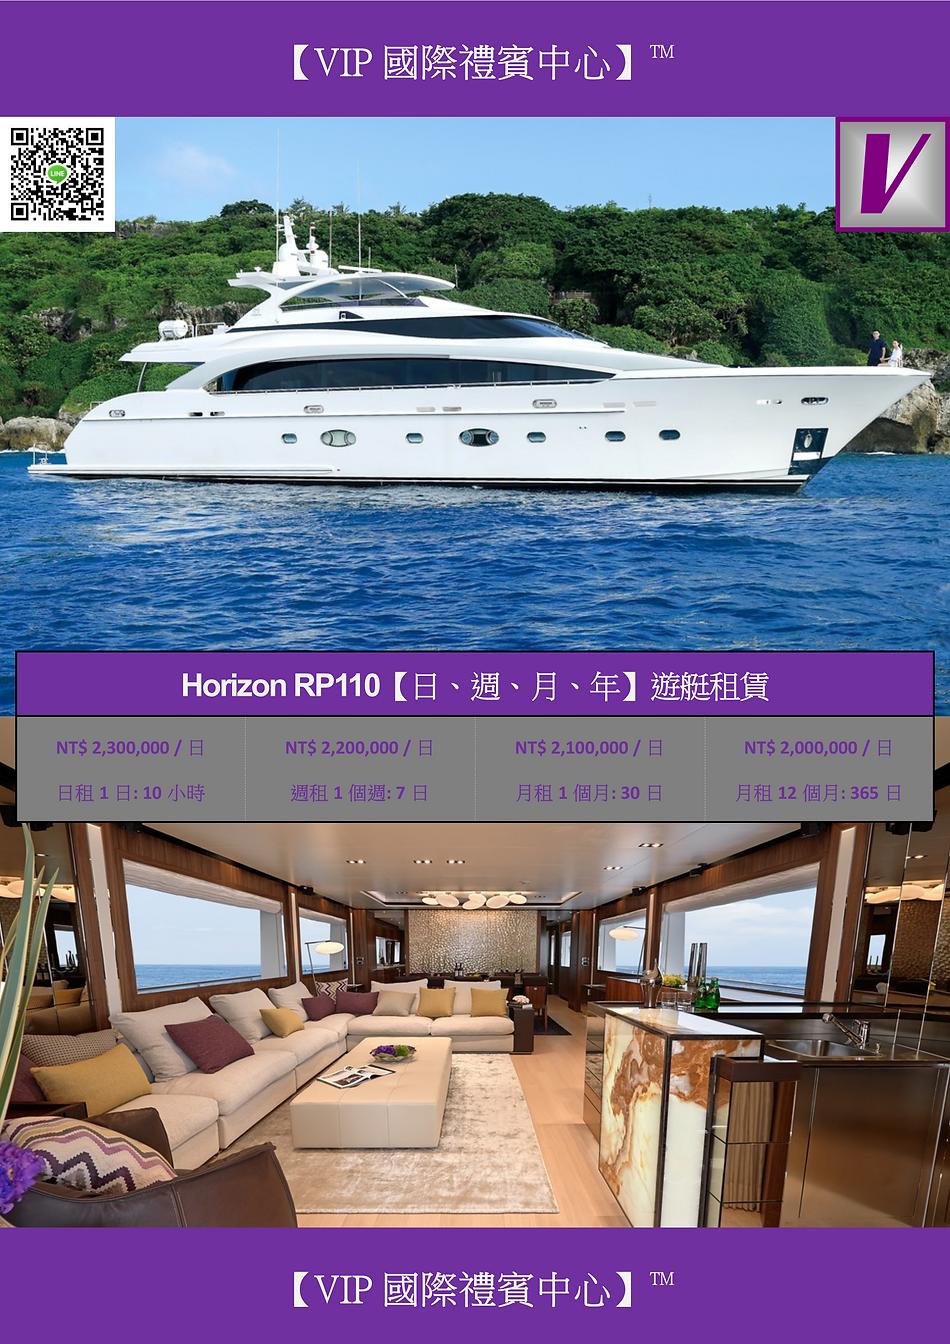 VIP國際禮賓中心 HORIZON RP110 DM.png